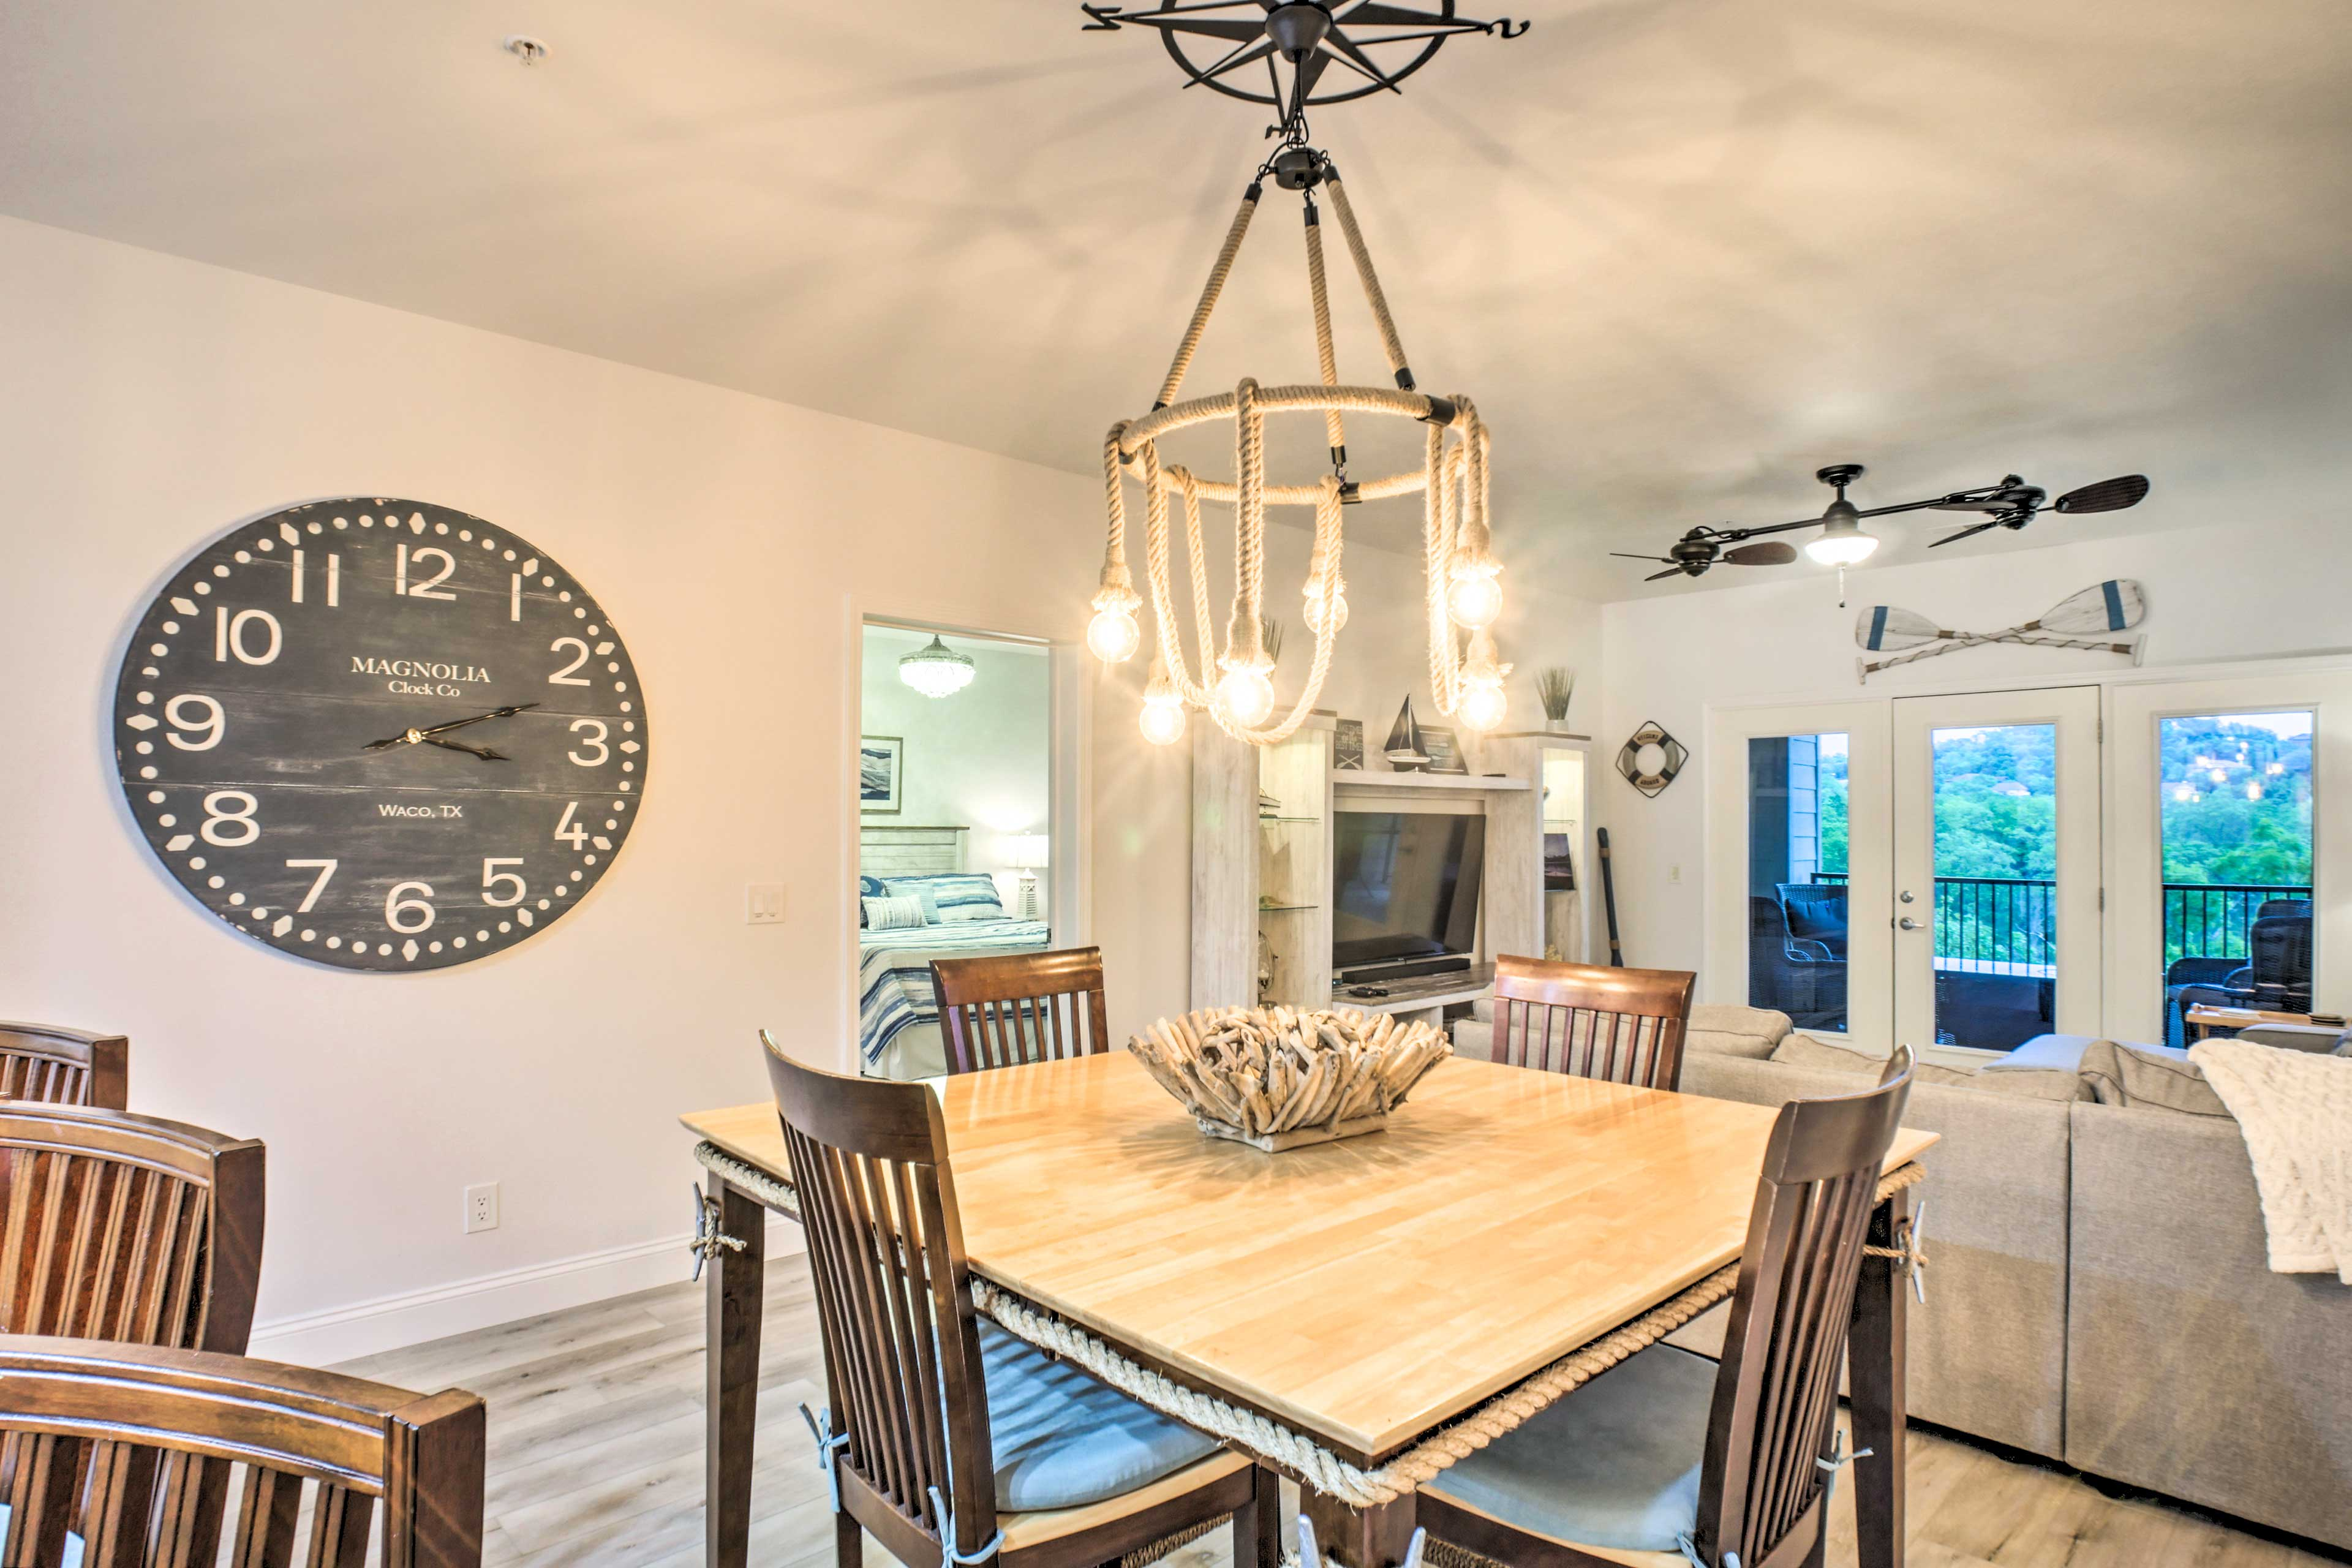 Enjoy tasteful touches such as this marine-style chandelier.